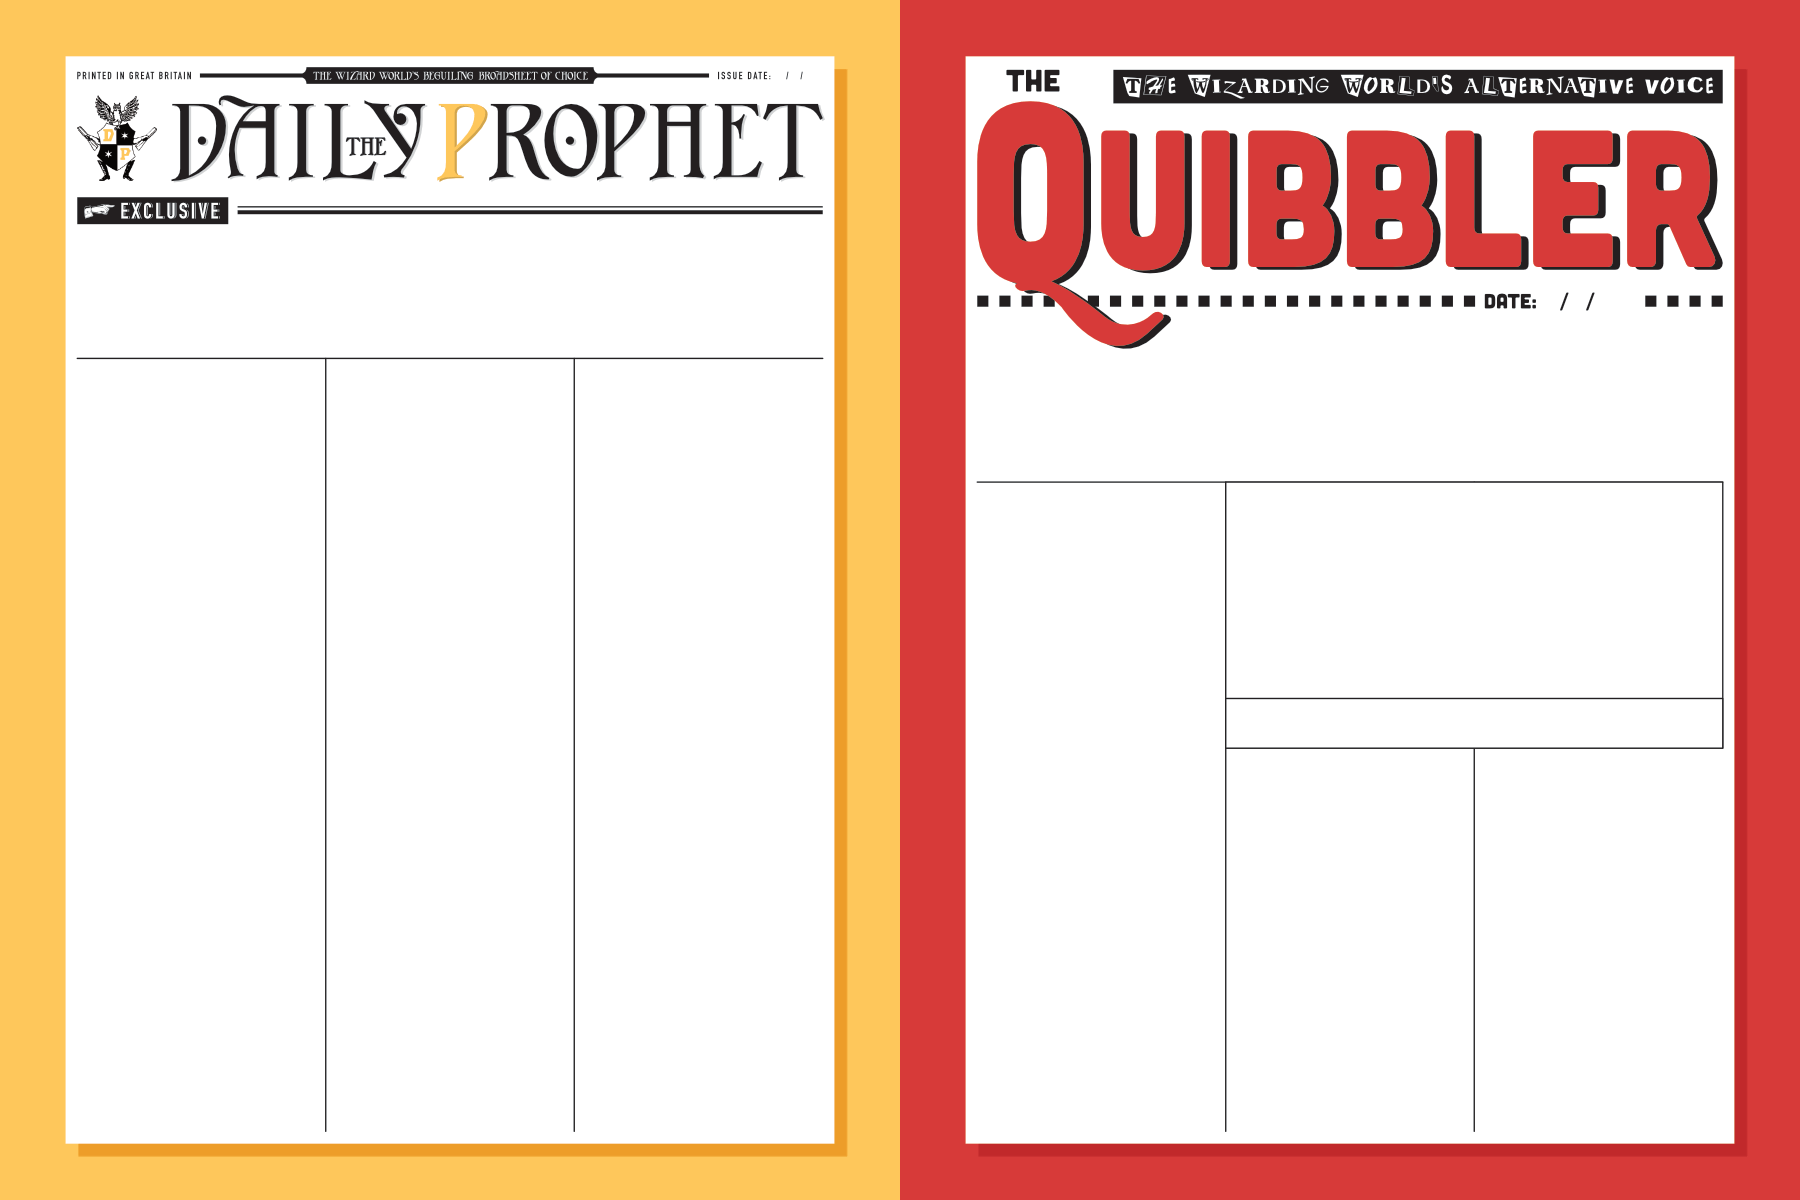 picture regarding Printable Newspaper Templates named Harry Potter Newspaper Templates - PAPERZIP